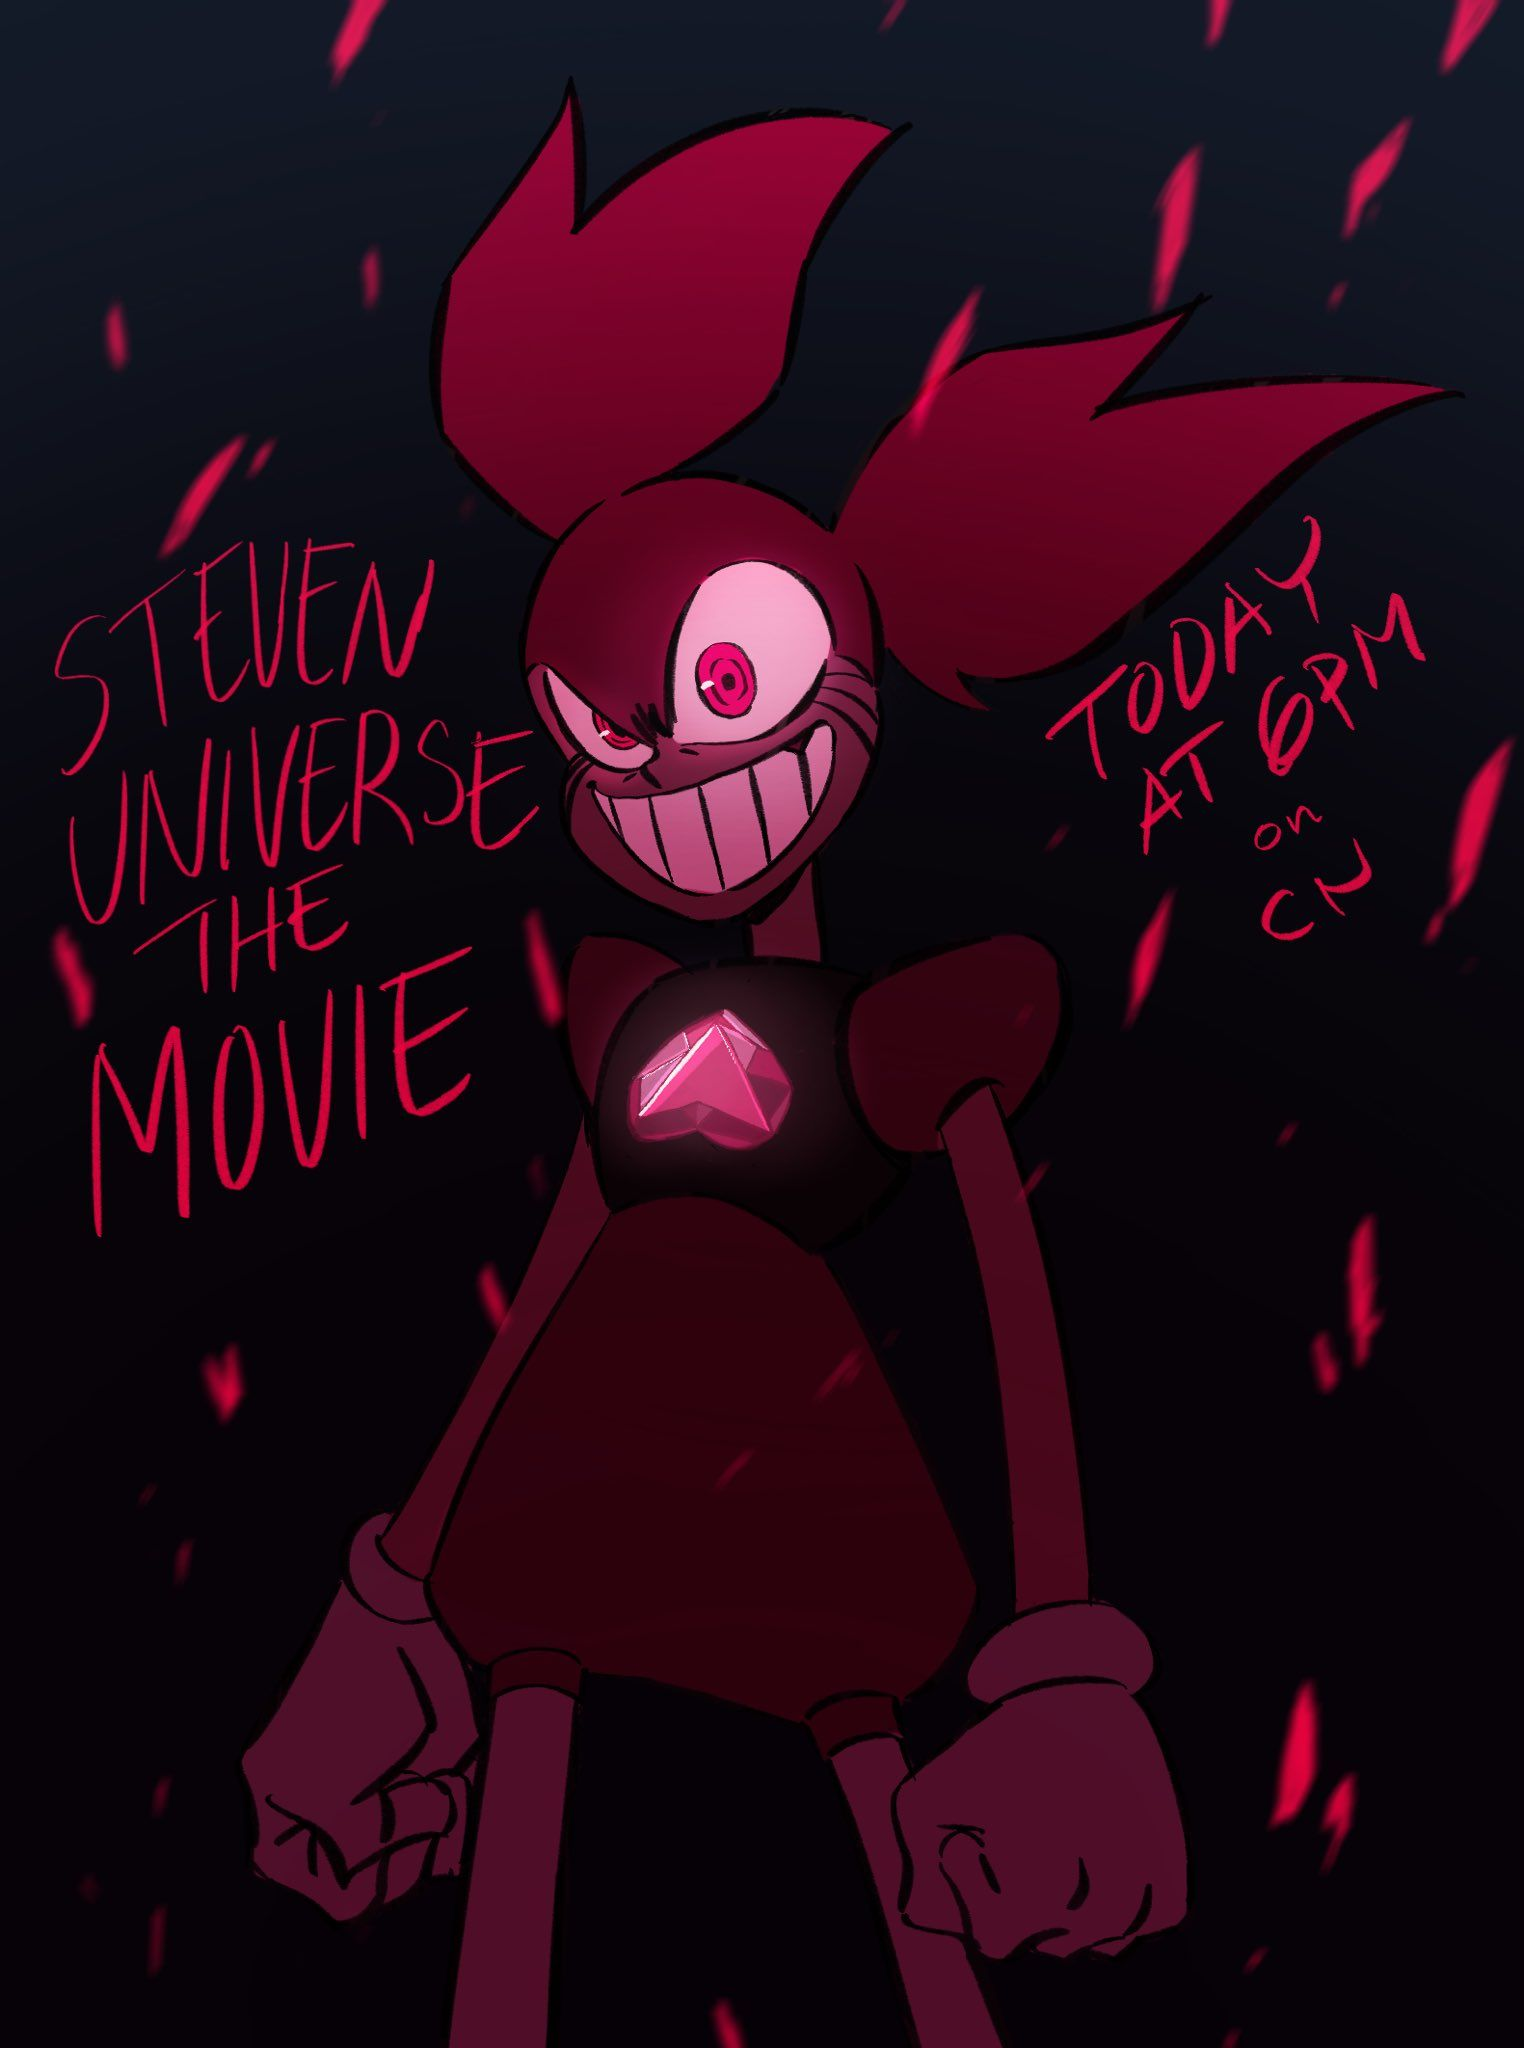 Lei Lei on Steven universe movie, Steven universe ships